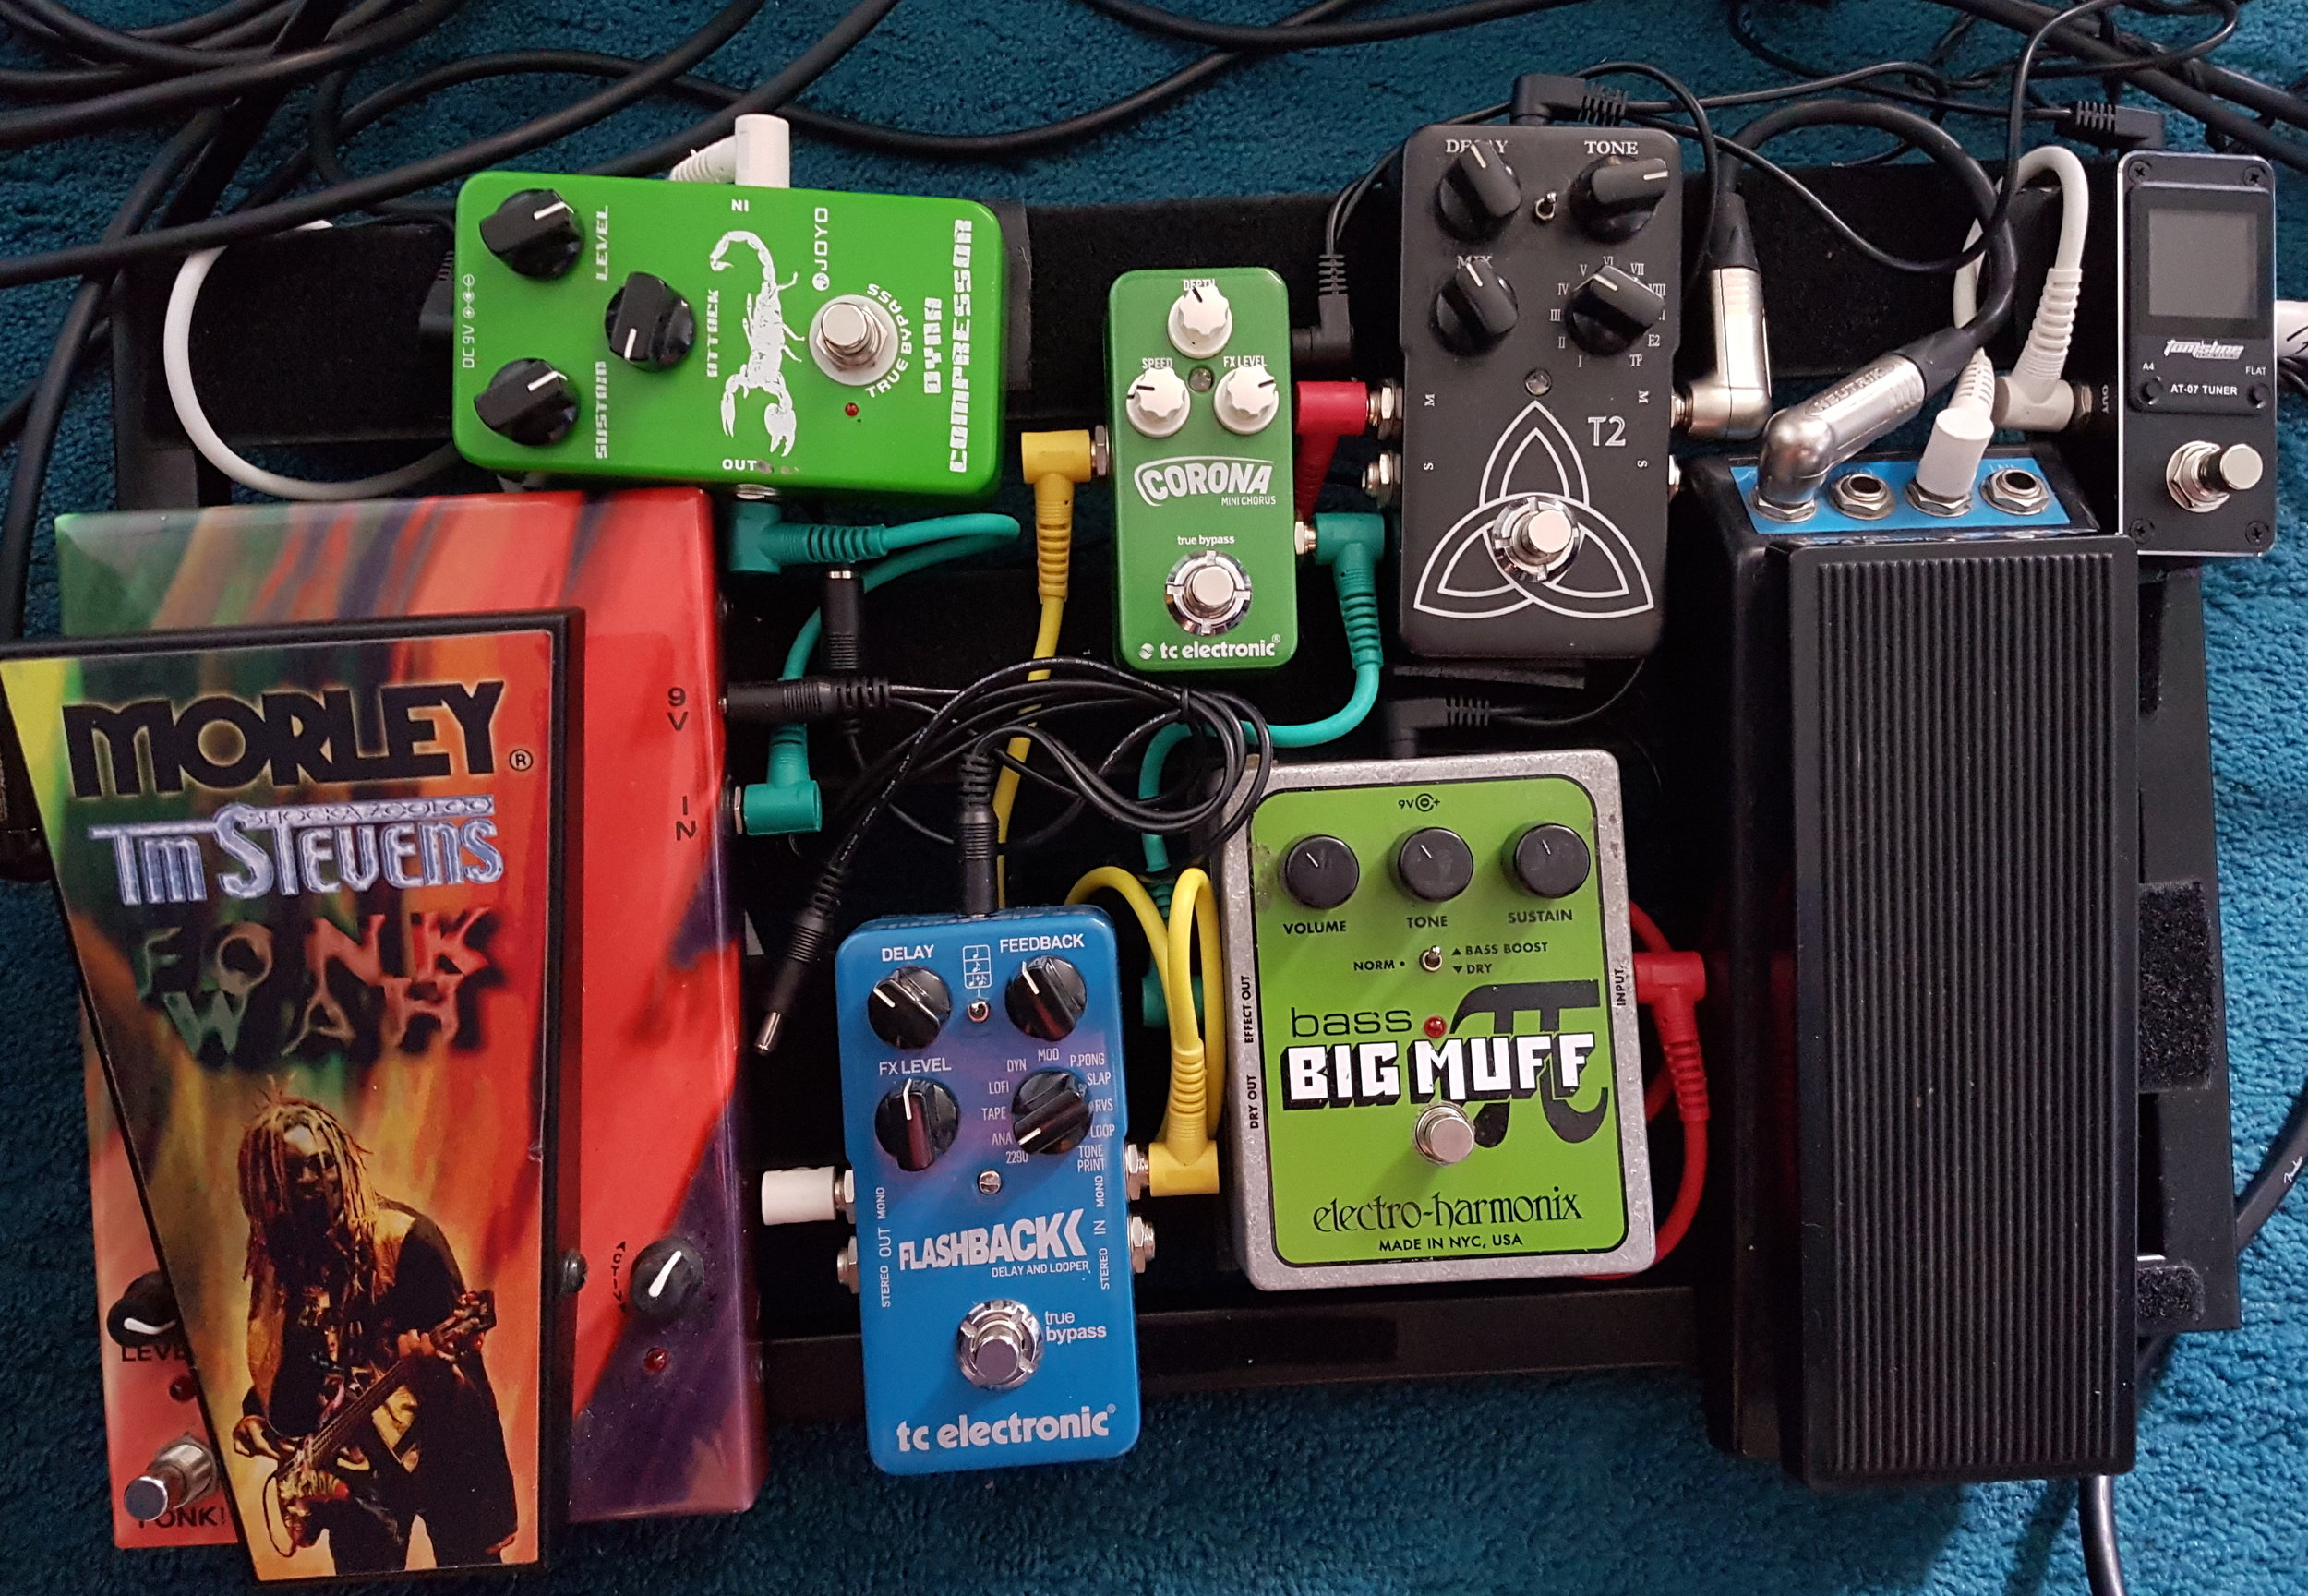 Electro Harmonix Bass Big Muff Pi,Morely Bass Wah,TC Electronics Flashback Delay,TC Electronics T2 Reverb,TC Electronics Corona Chorus,Joyo Dyno Compressor